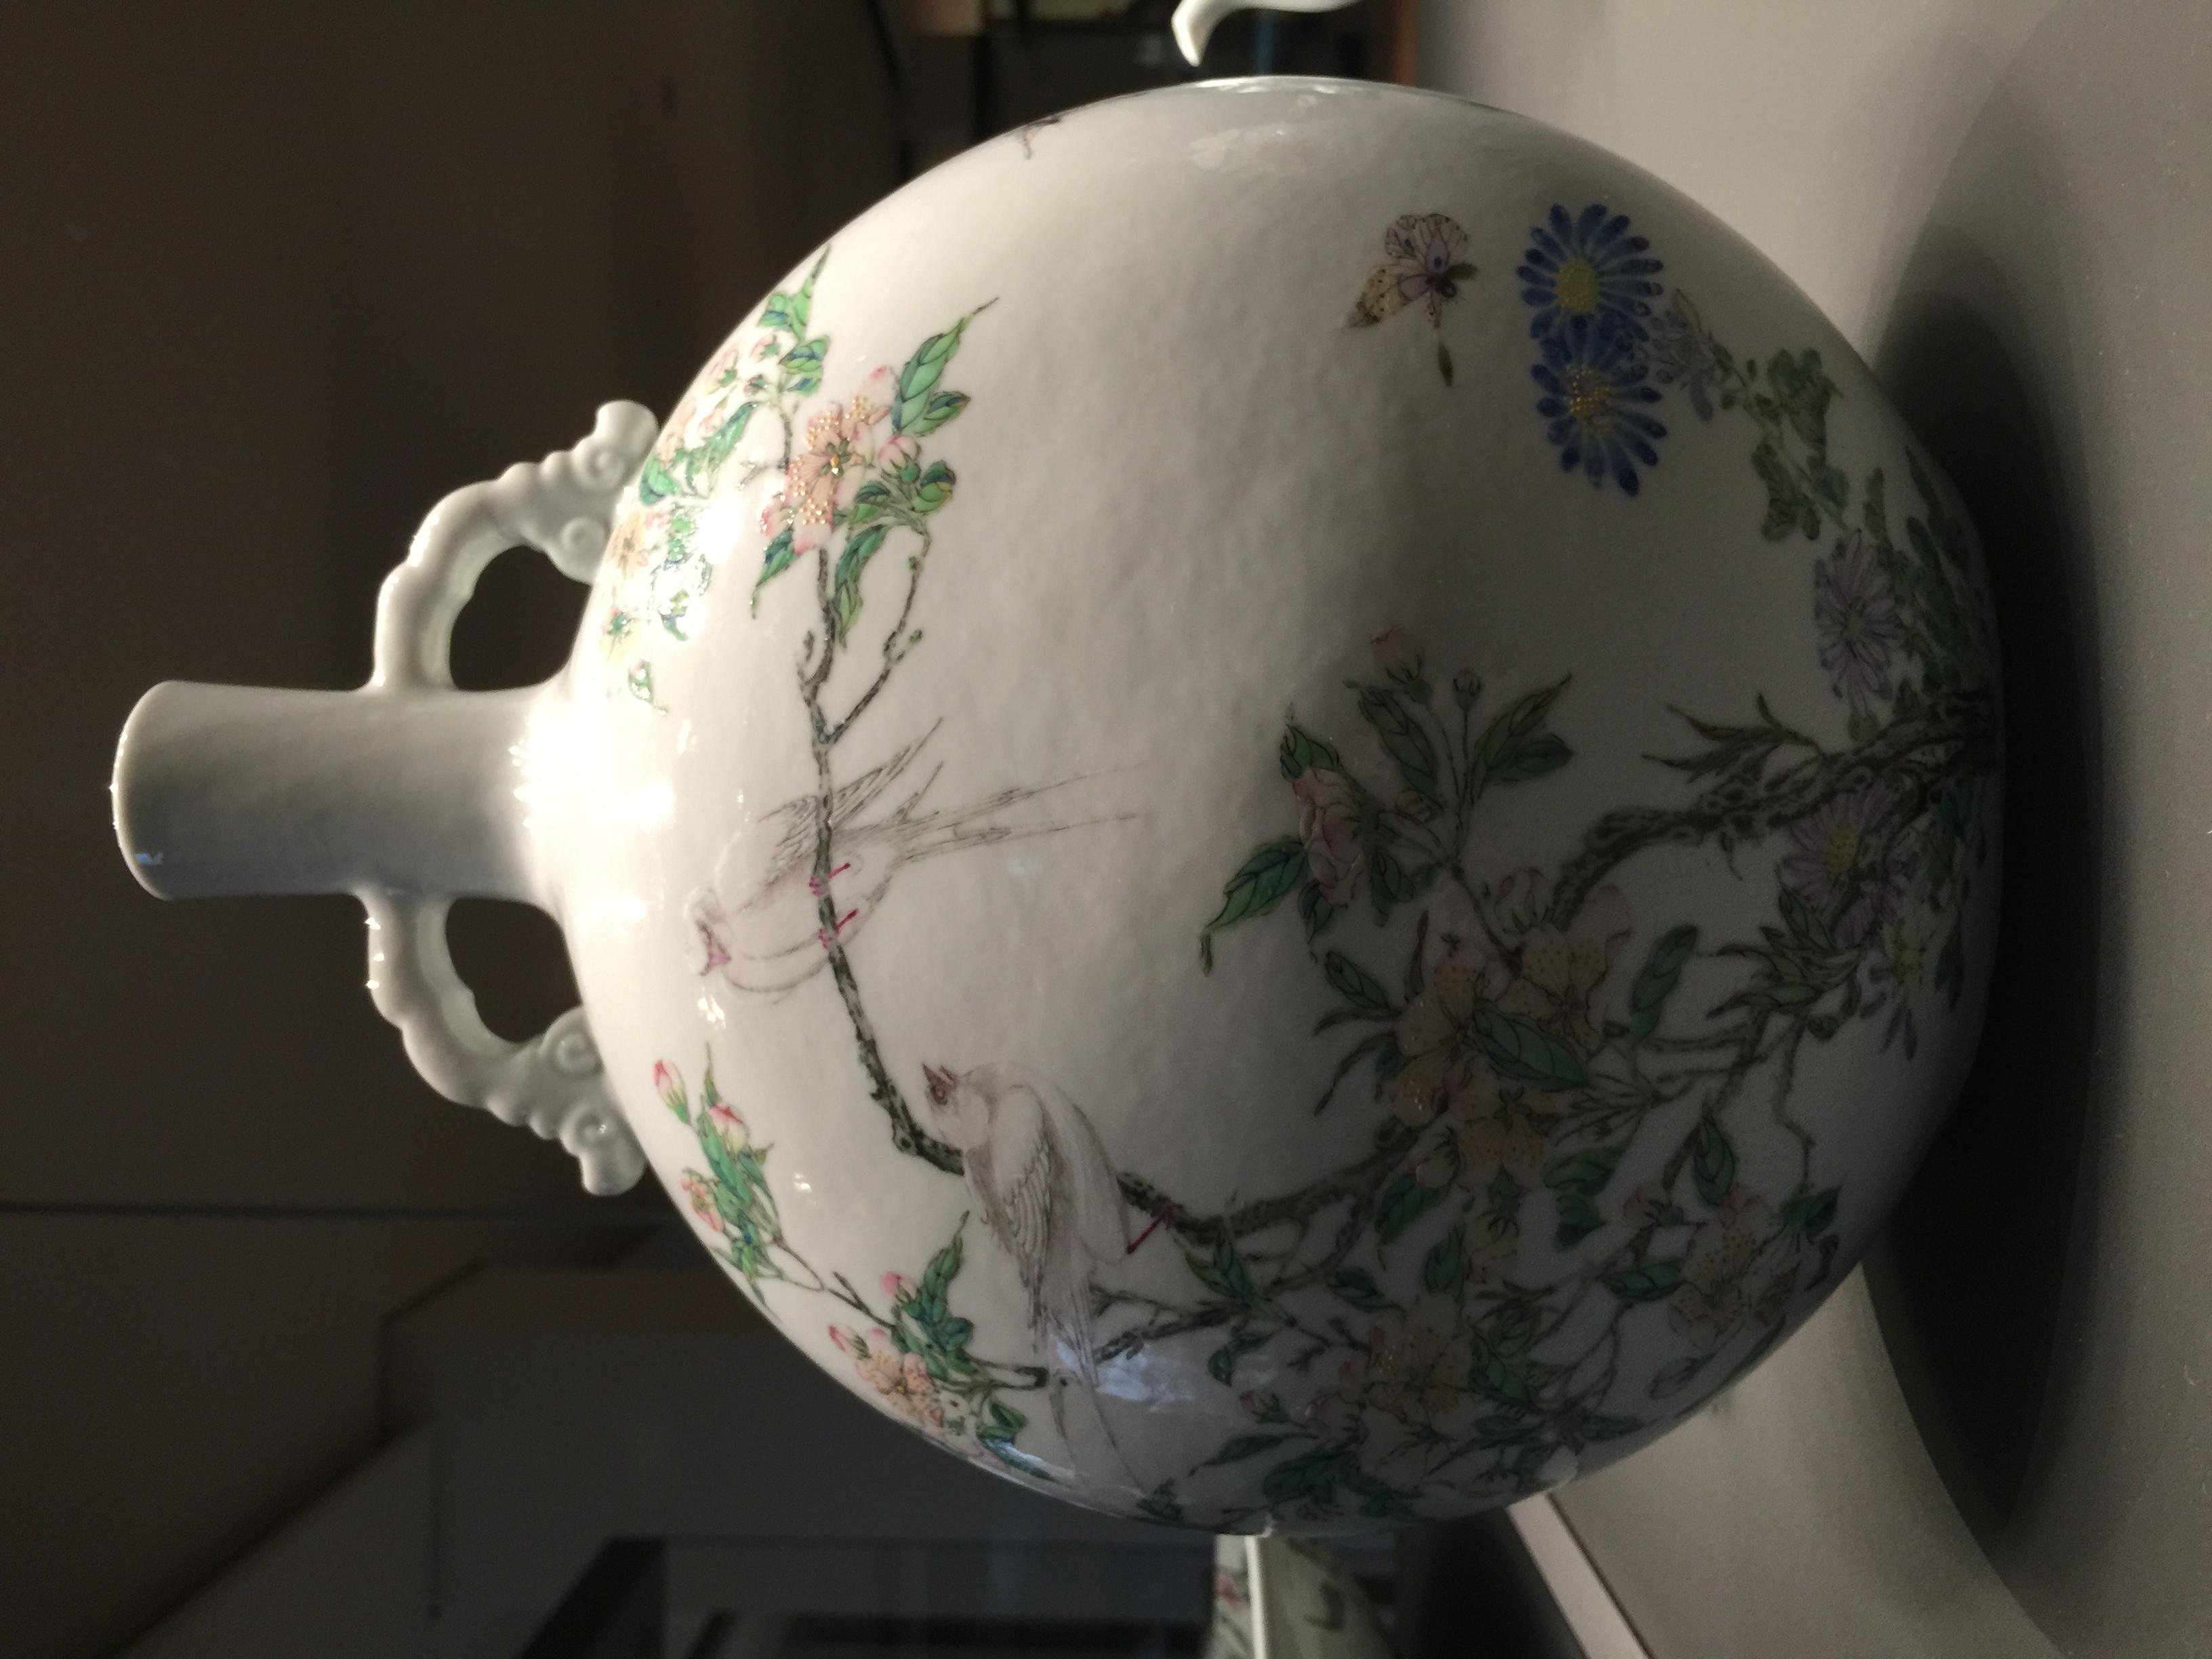 Chinese-Porcelain-British-Museum-Percival-David-jessewaugh.com-116.jpg